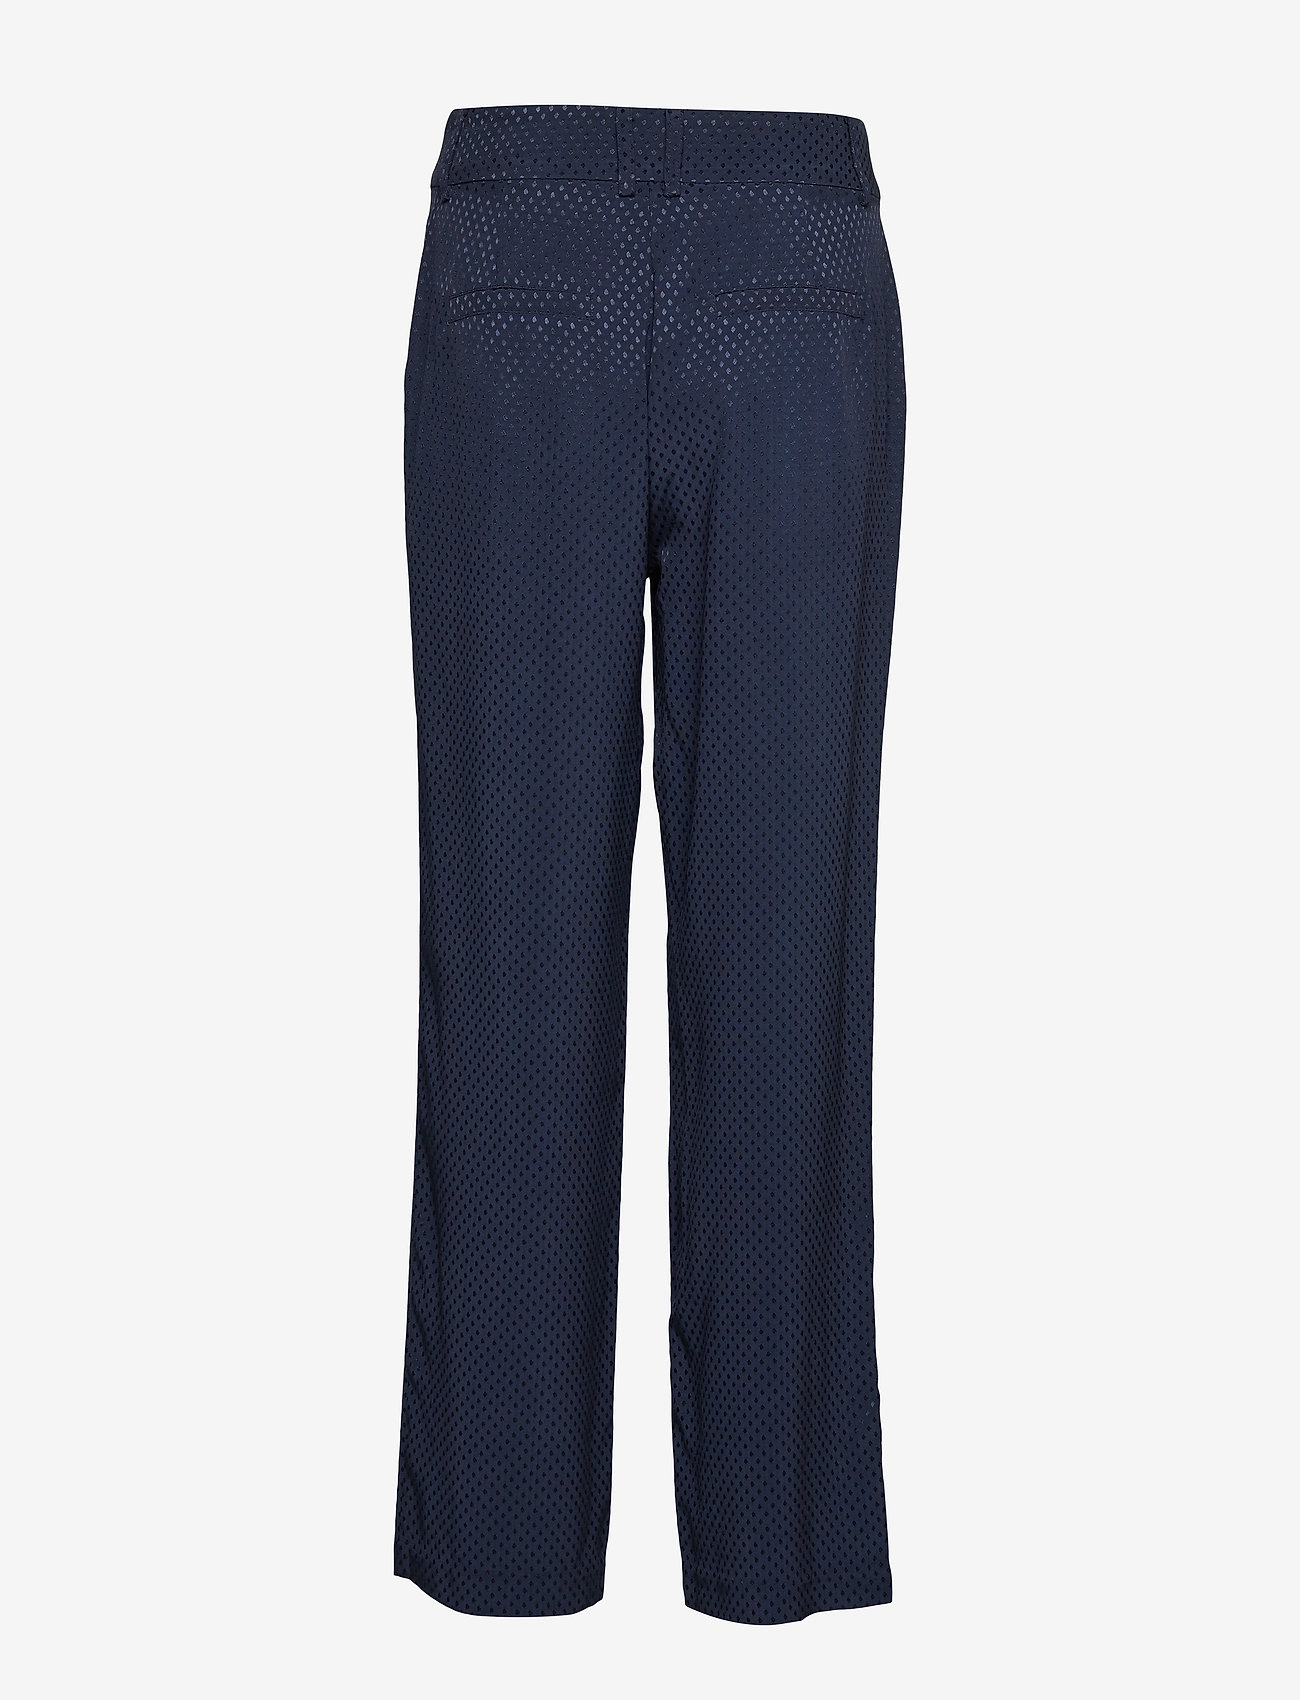 Sella Pants (Black Iris) - Minus a6N8PS